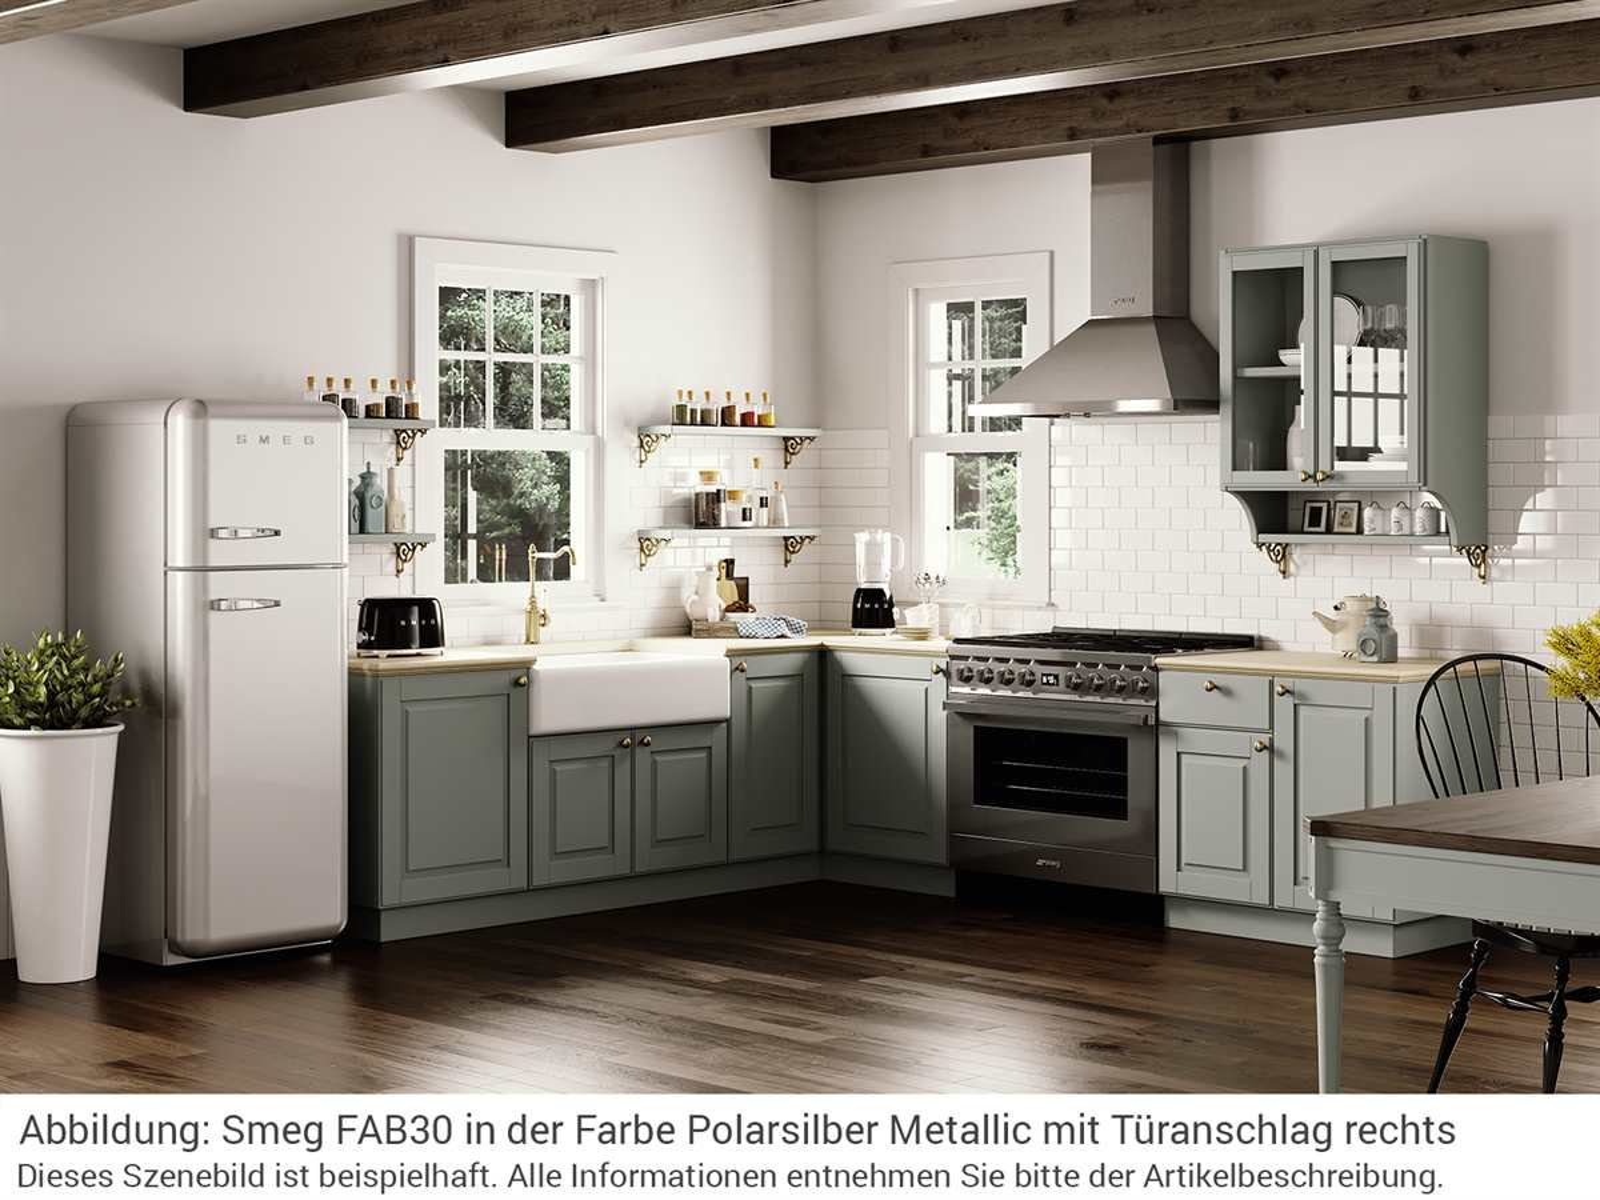 Smeg FAB30RSV3 Kühl-Gefrierkombination Polarsilber Metallic